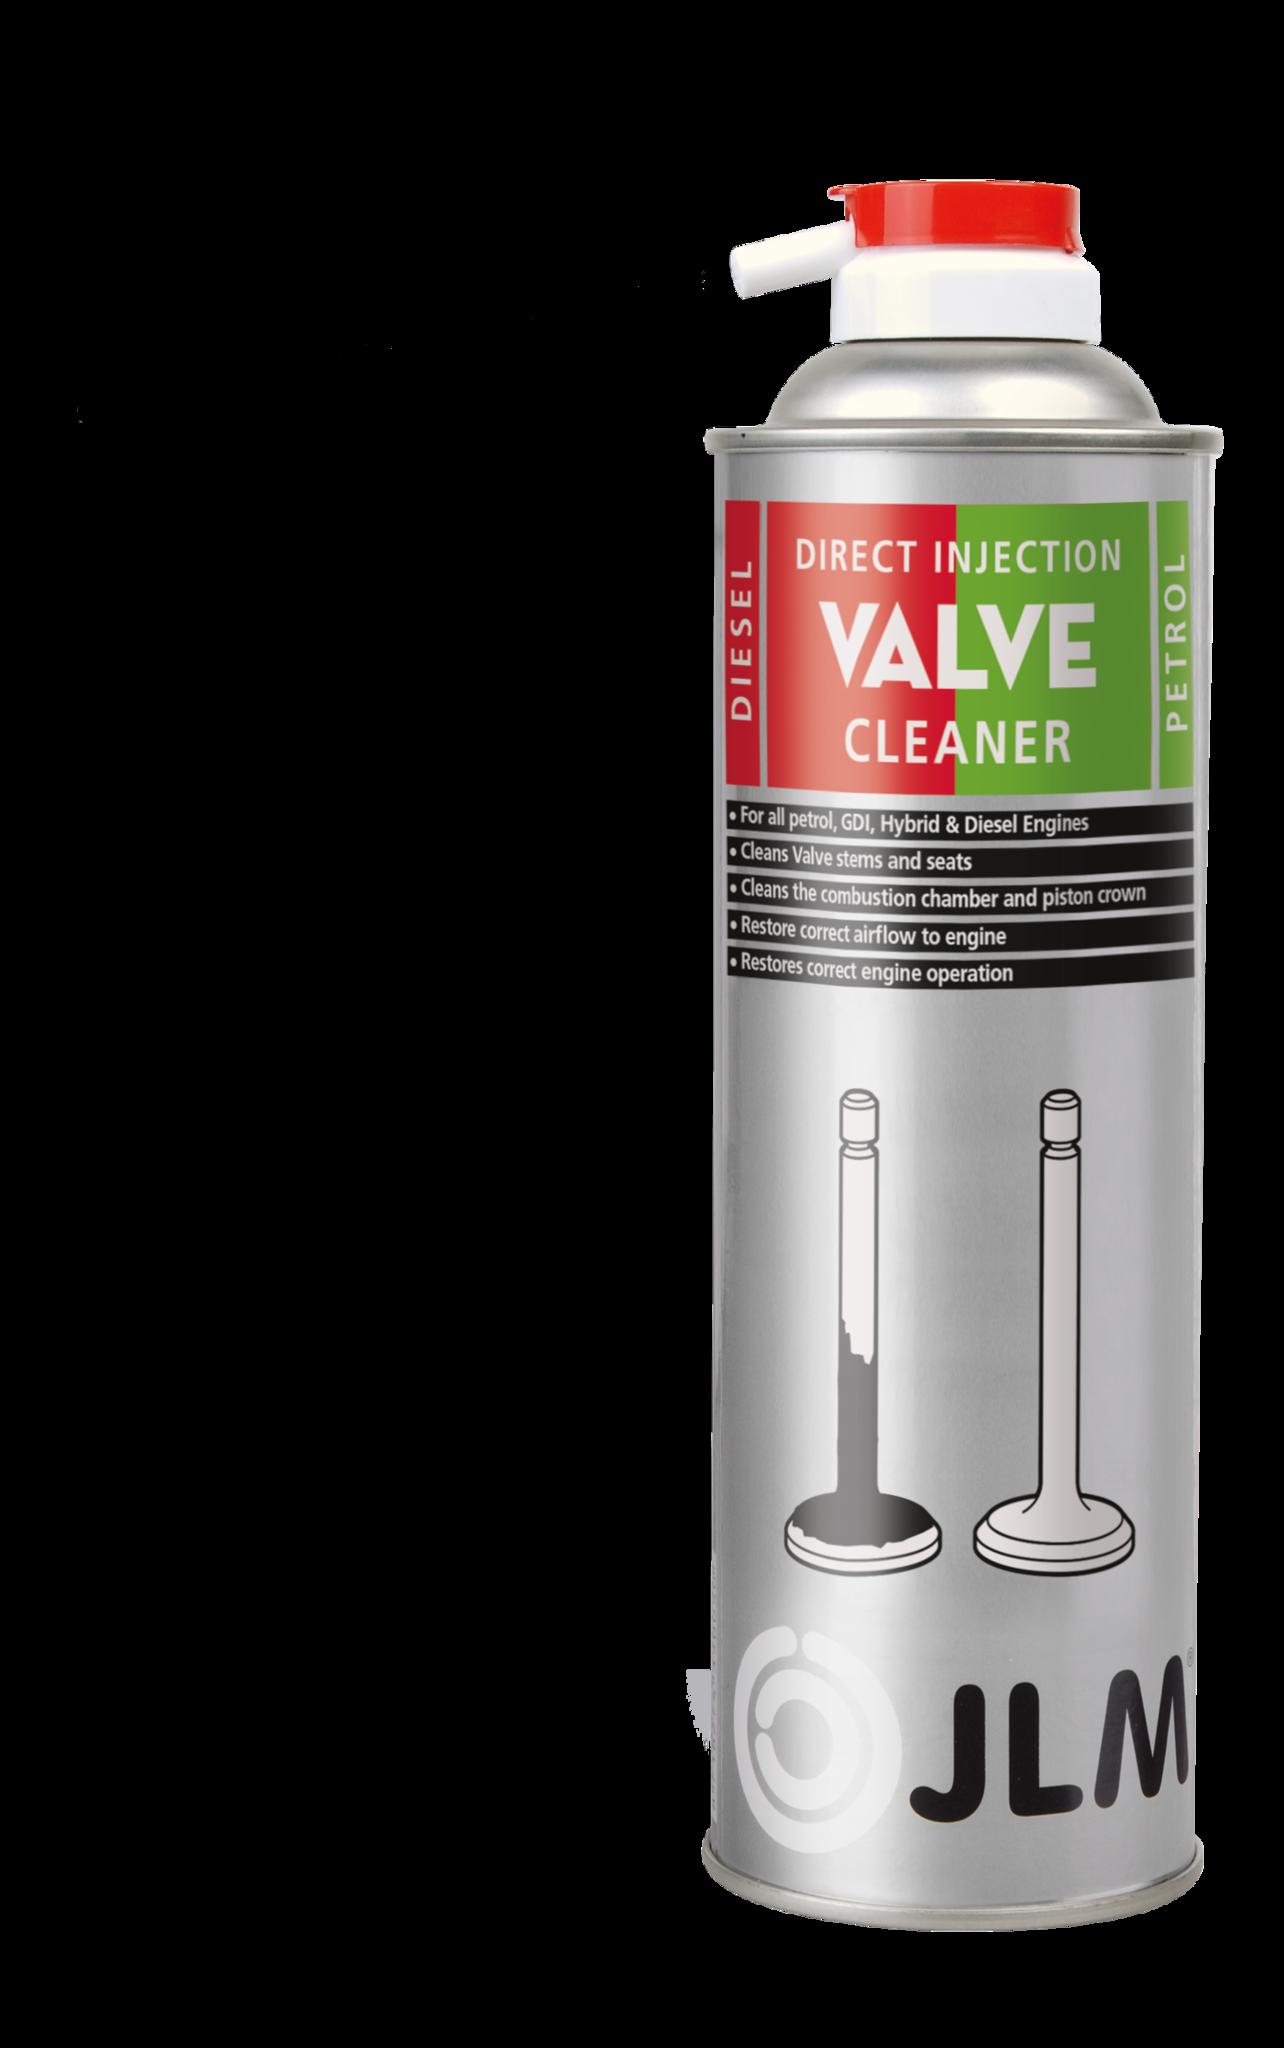 JLM Direct Injection Valve Cleaner Spray